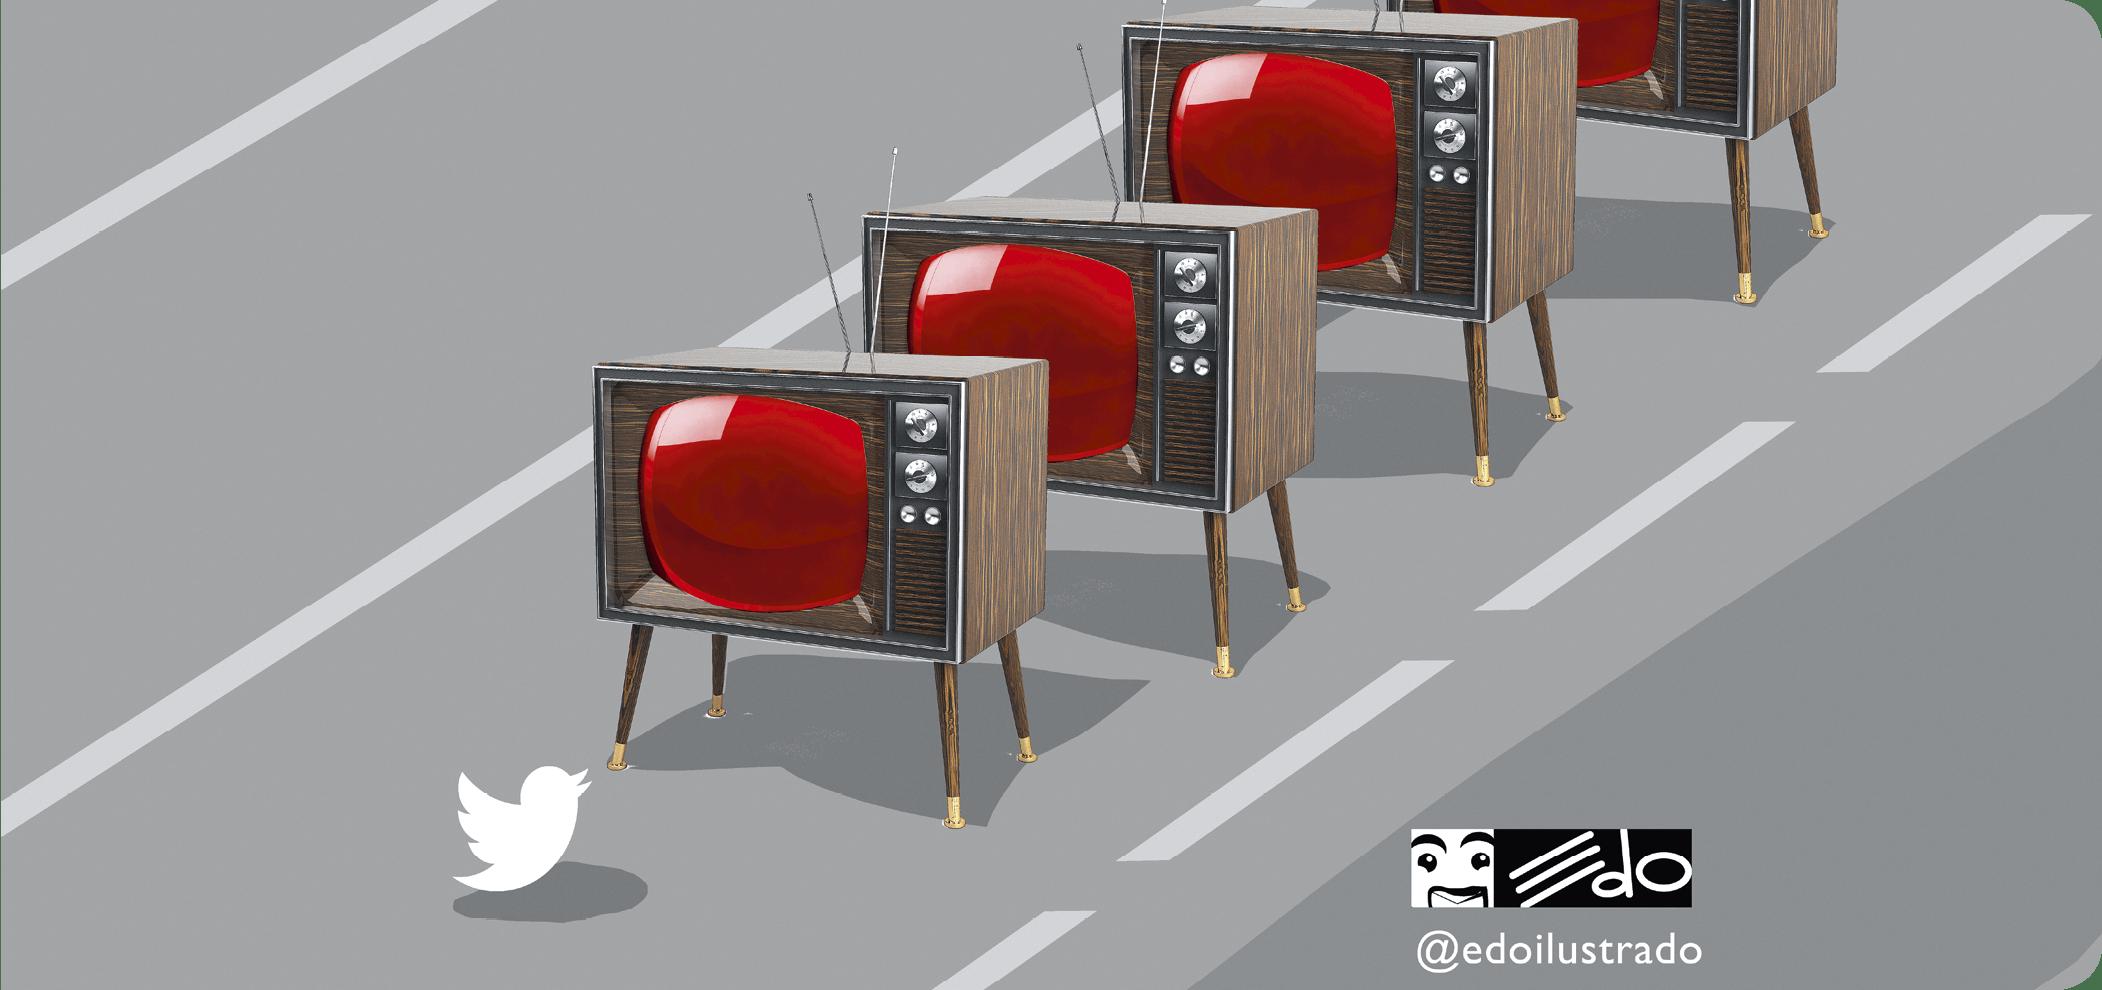 EDO ilustrado, Nuestro #Tiananmén #censura #Venezuela, 2018.